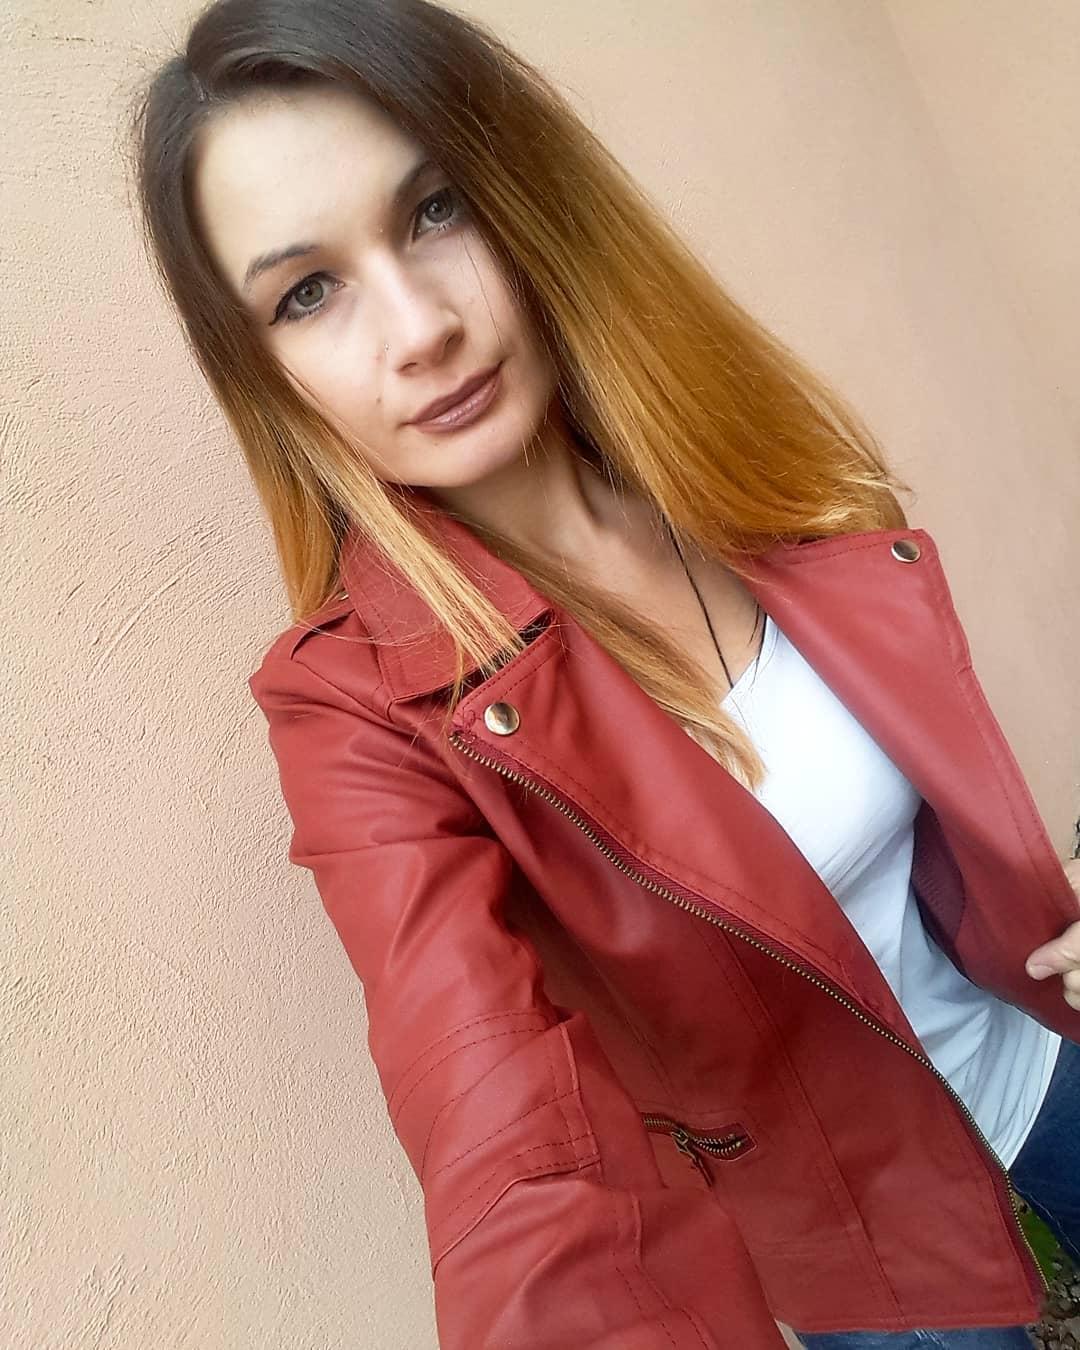 Olga-Madych-Wallpapers-Insta-Fit-Bio-18